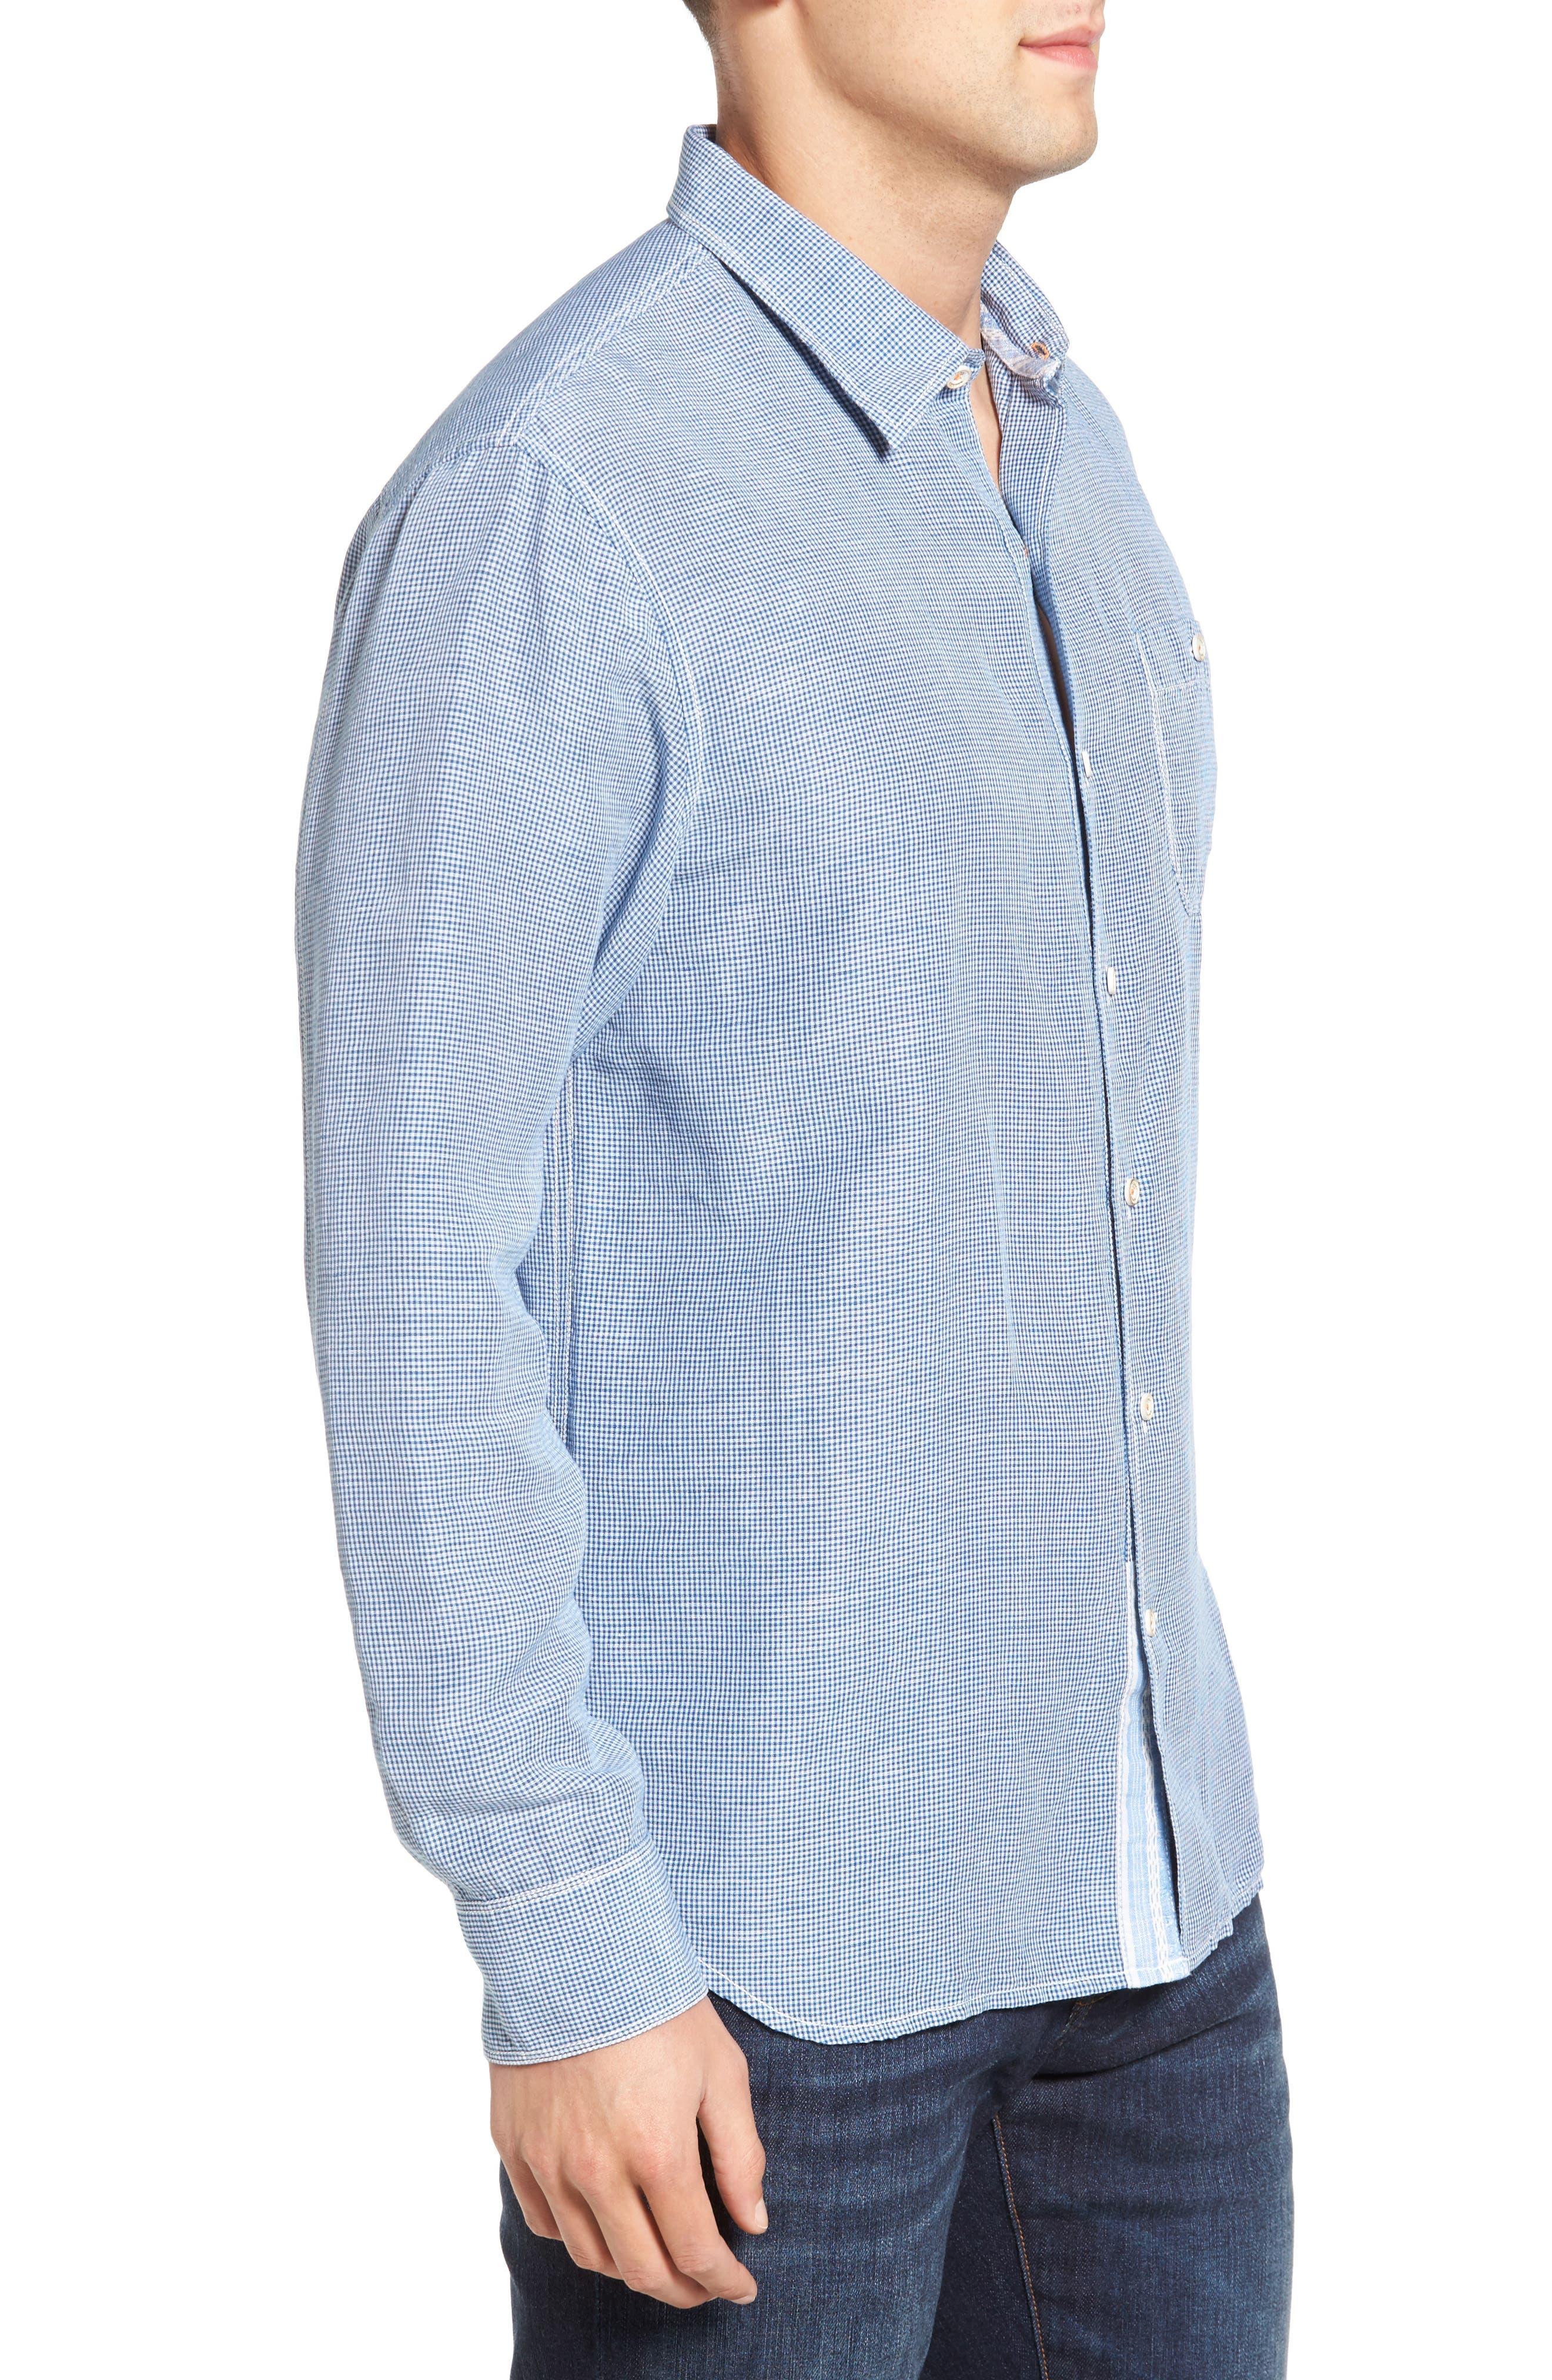 Sand Linen Island Modern Fit Sport Shirt,                             Alternate thumbnail 3, color,                             Bering Blue